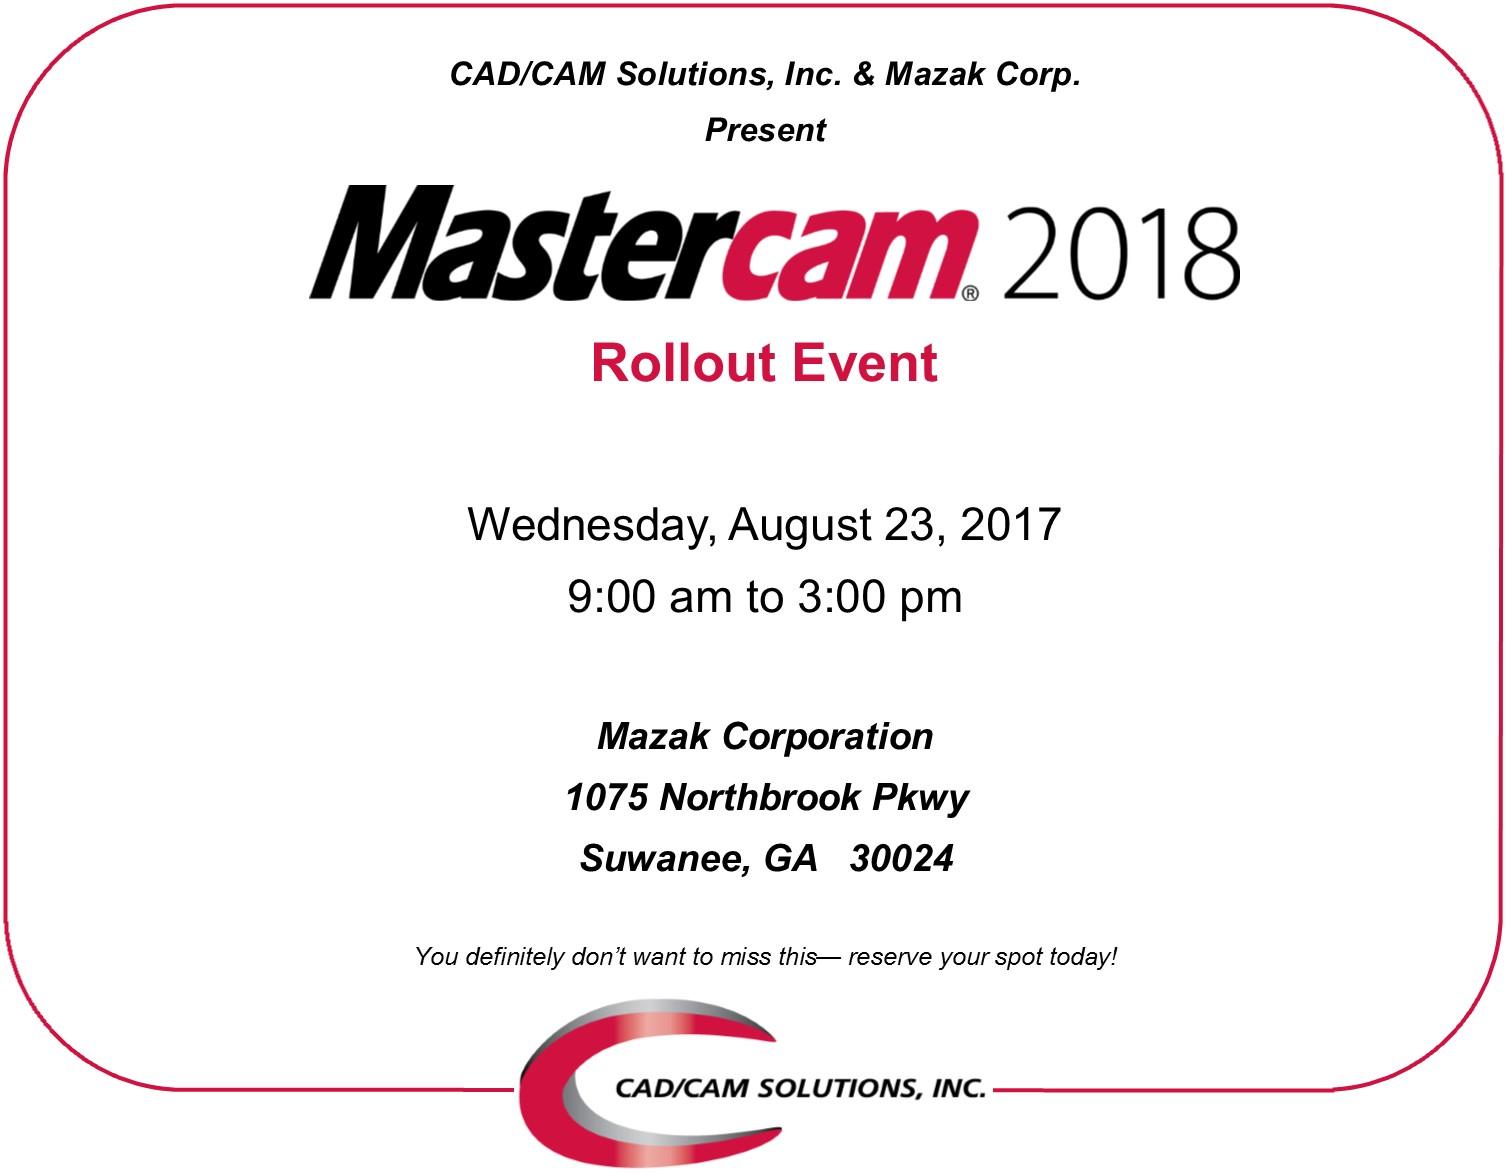 Mastercam 2018 Rollout Event 8/23/2017 9 - 3